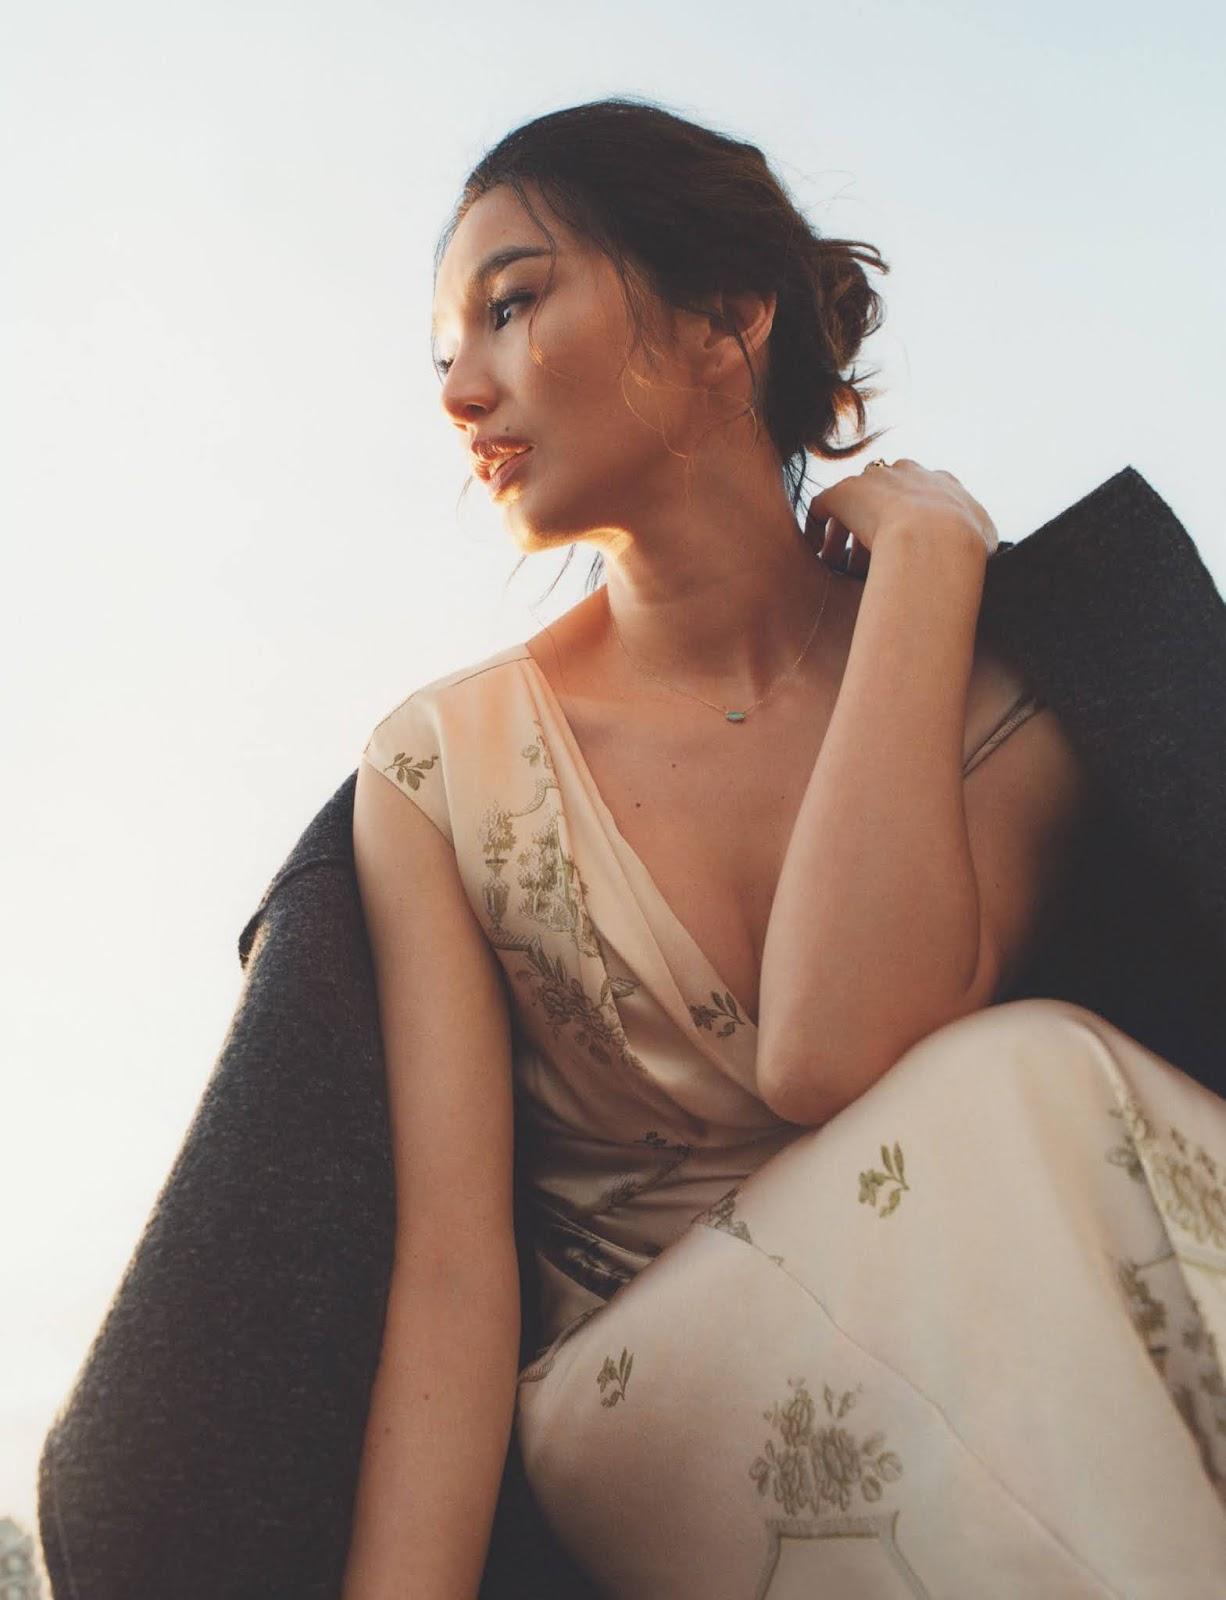 Gemma Chan in British Vogue September 2021 by Hanna Moon